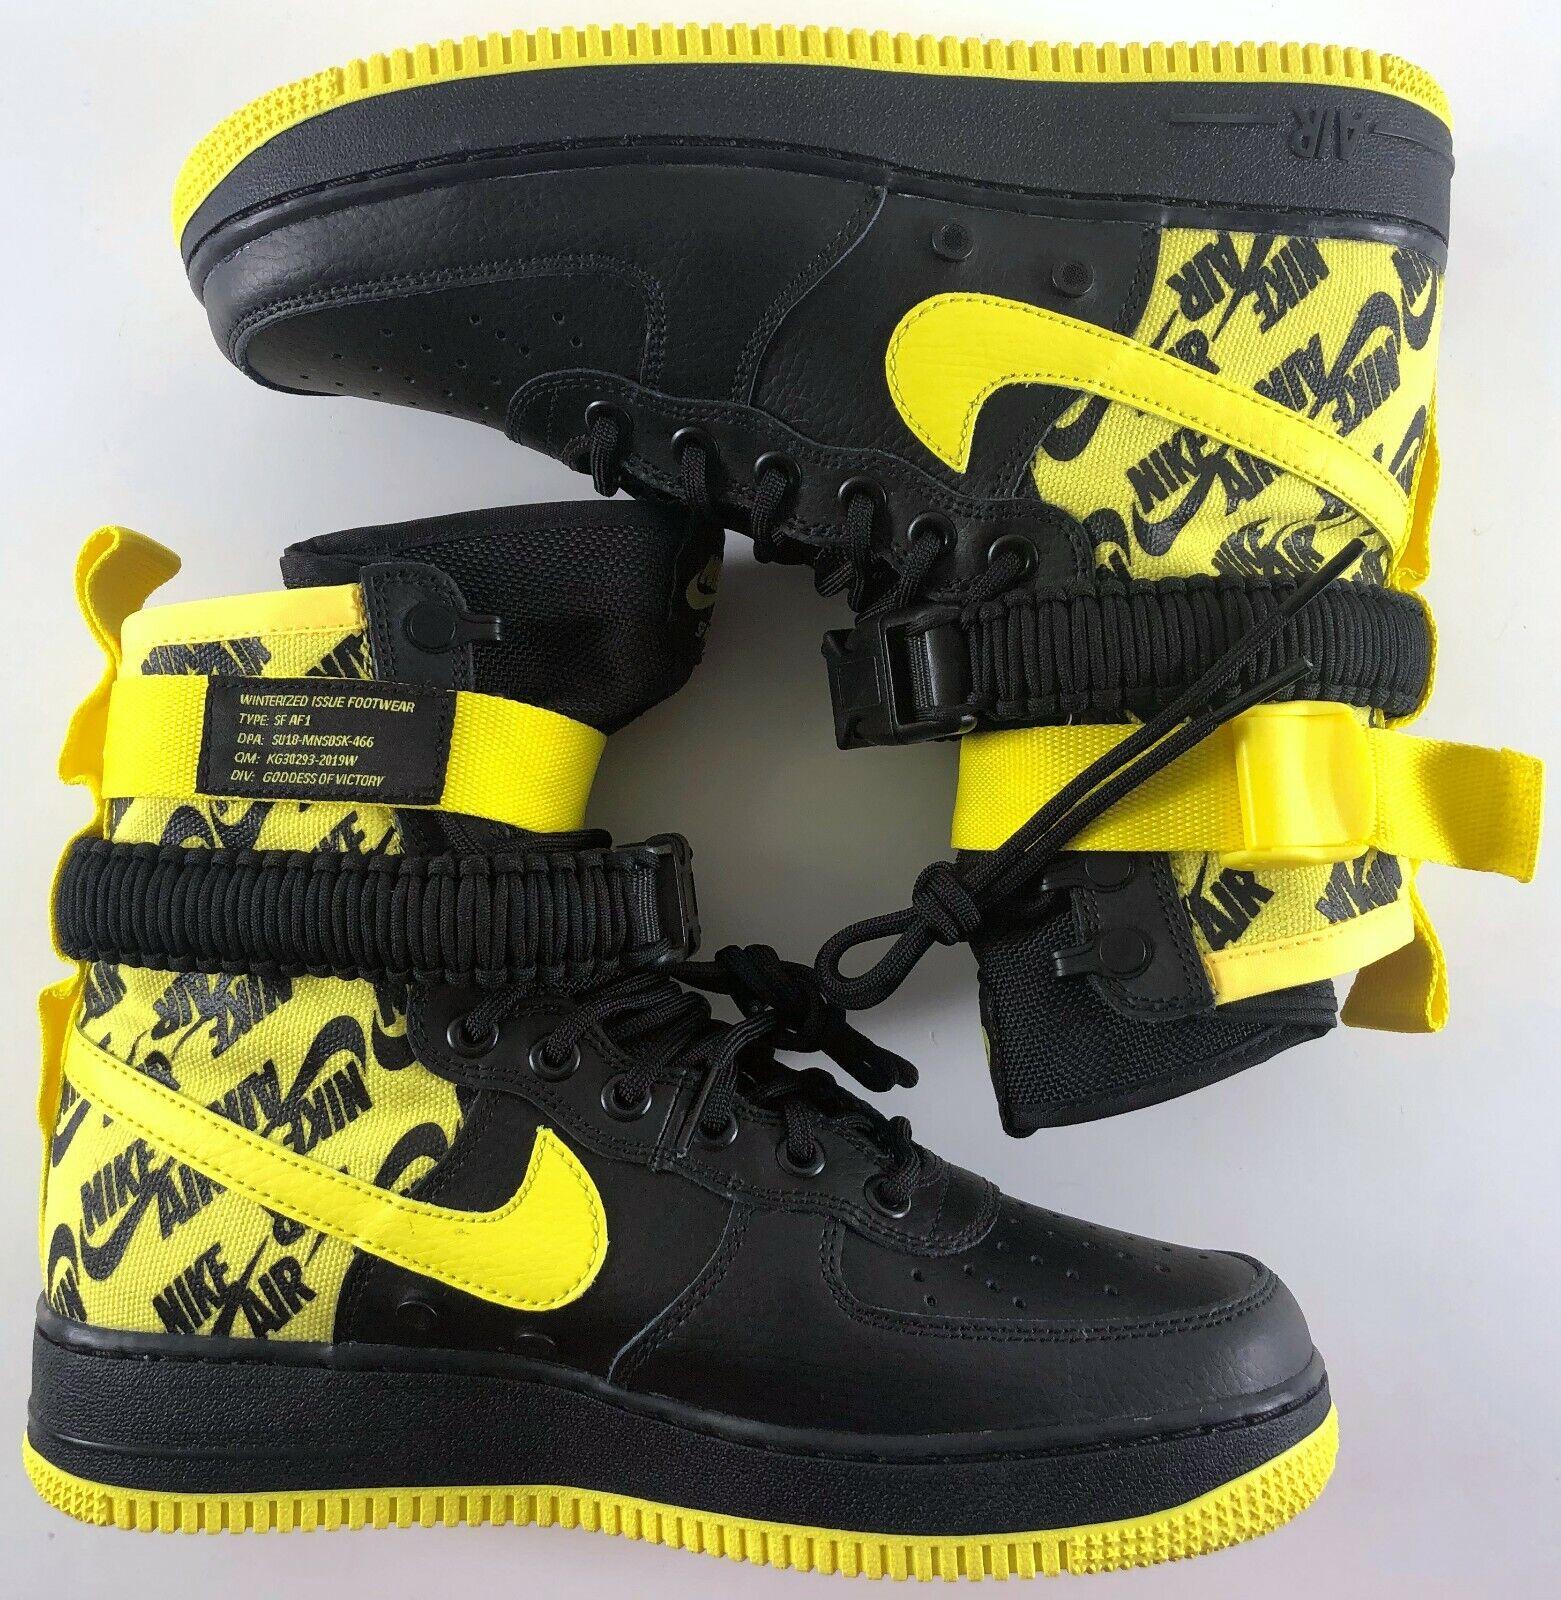 Nike Air Force 1 SF-AF1 High Men Boot Black   Dynamic Yellow AR1955-001 New